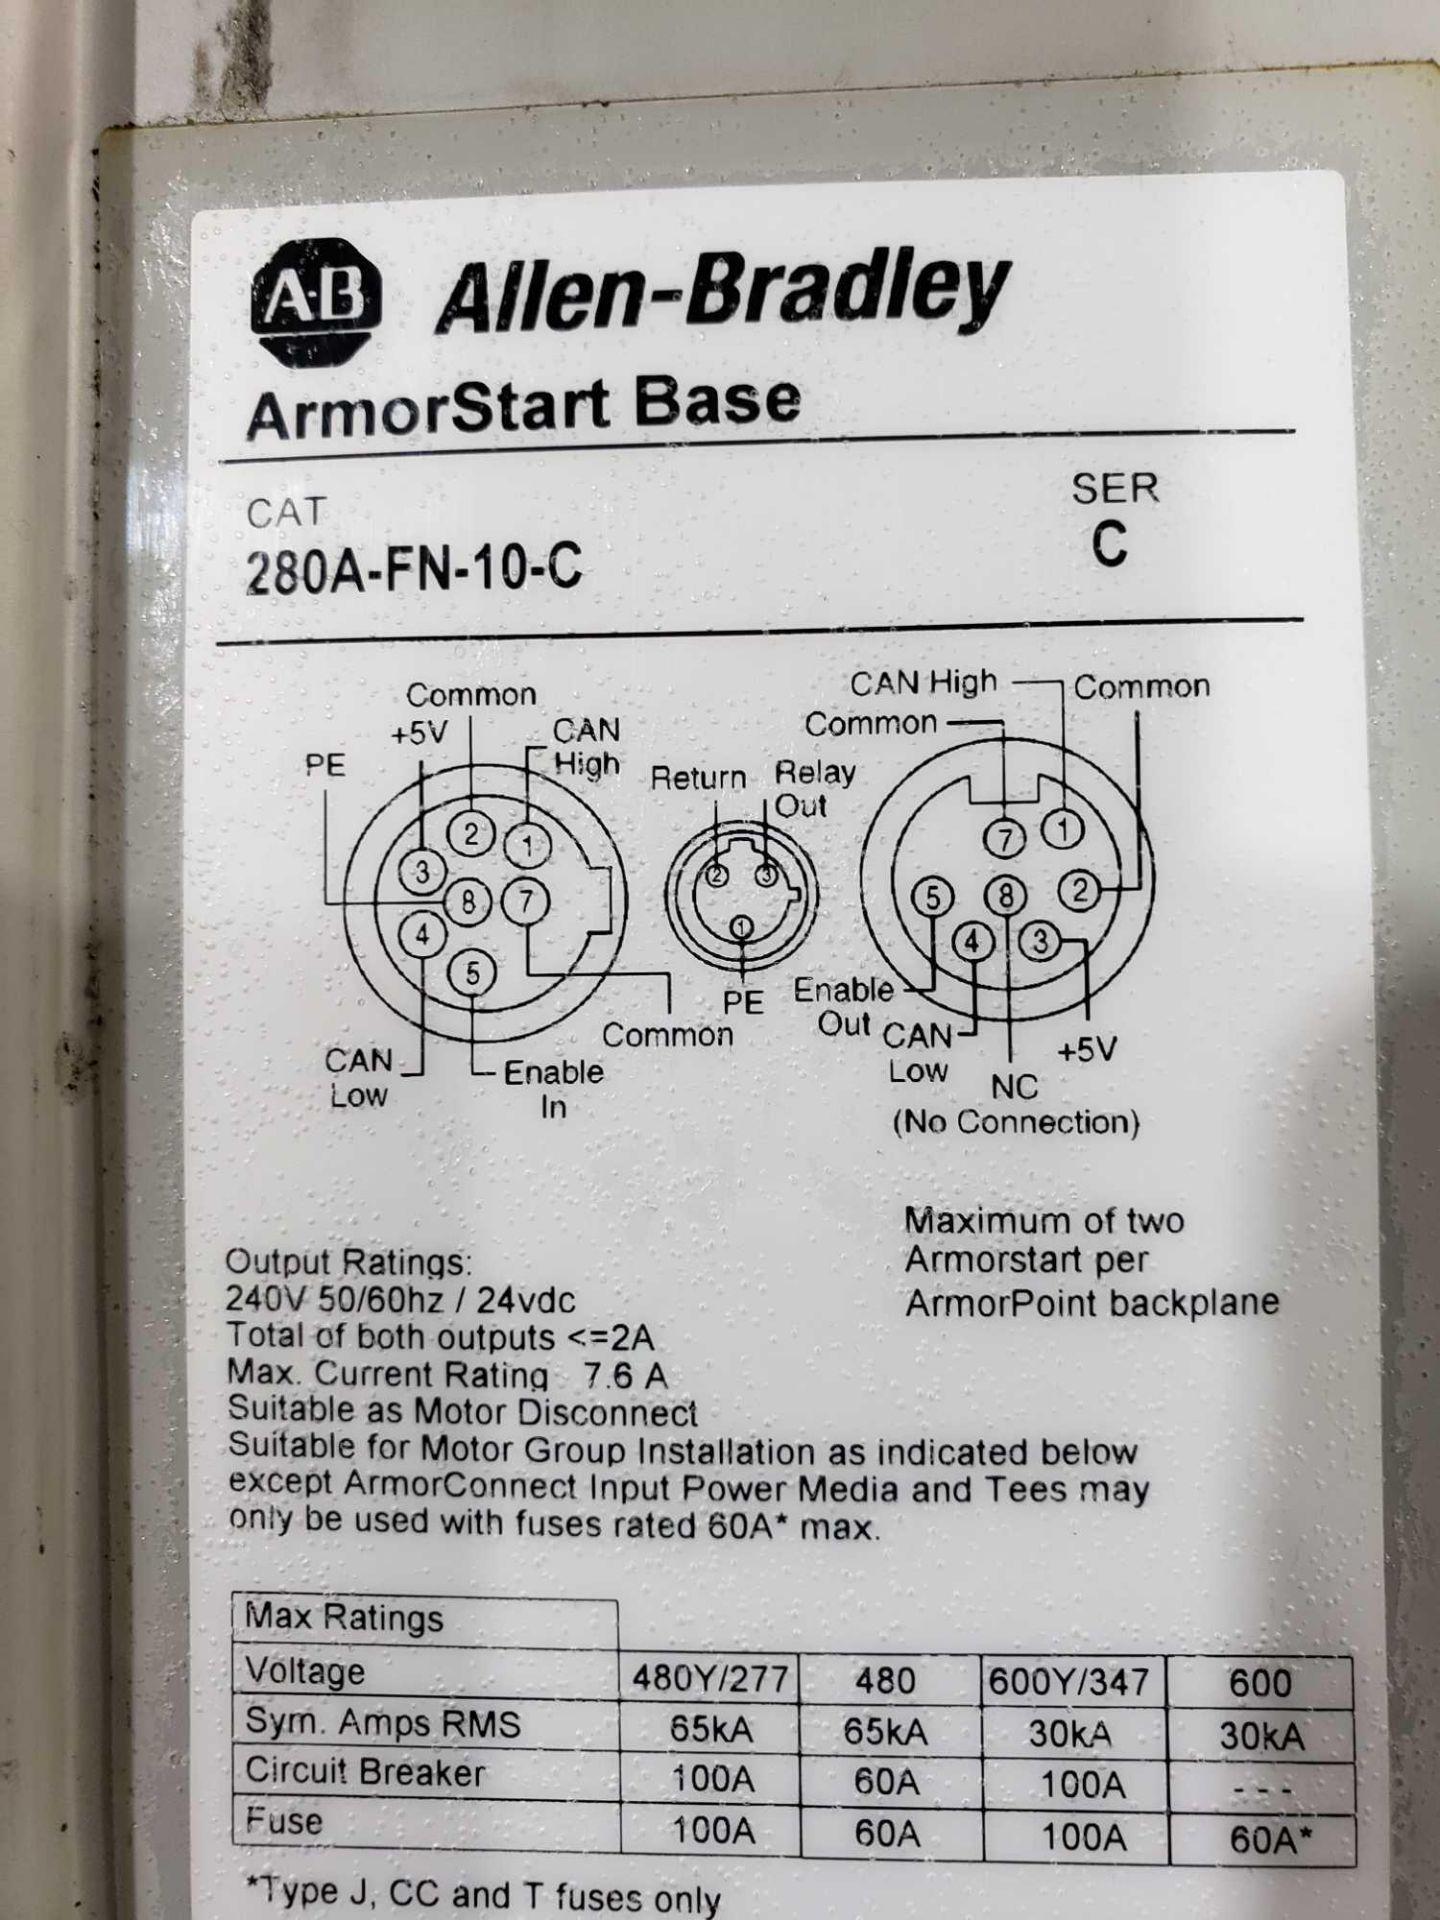 Lot 11 - Allen Bradley Armorstart Catalog 281A-F12Z-10A-CR with base Catalog 280A-FN-10-C.